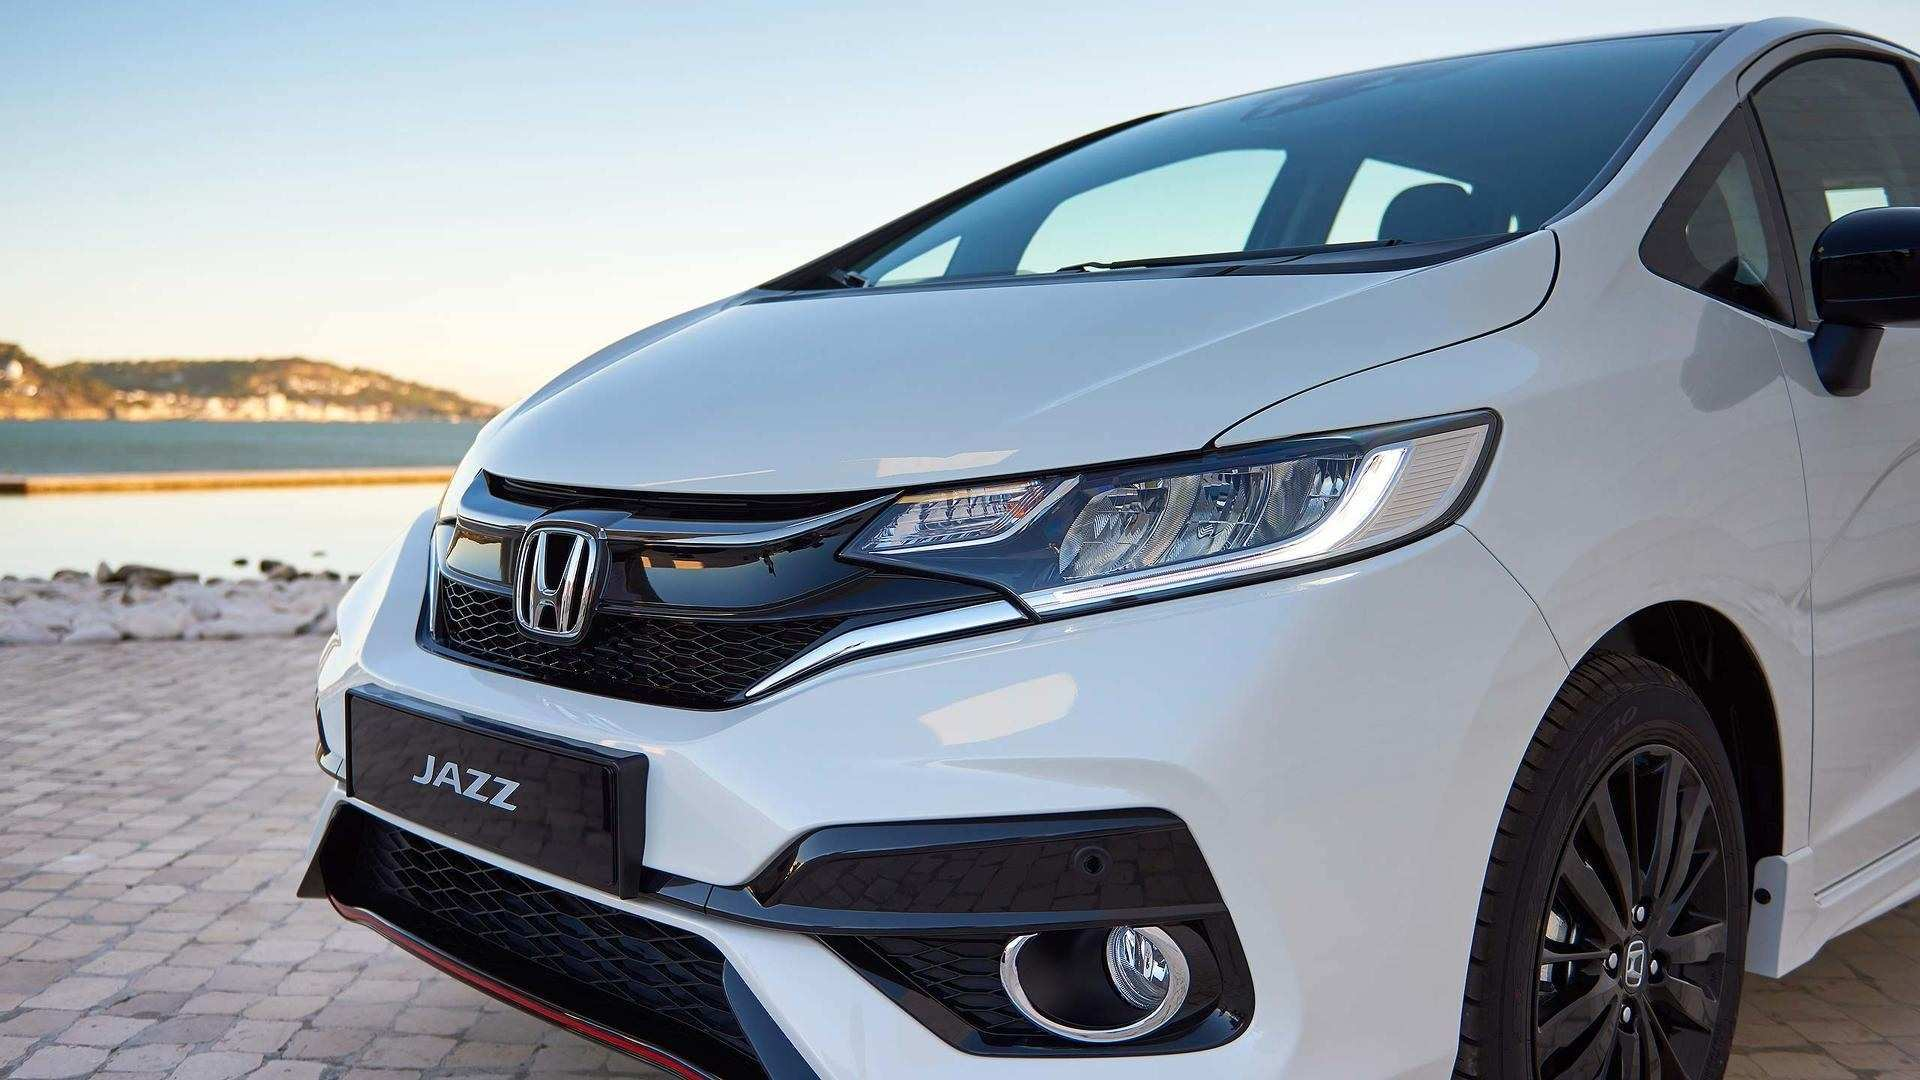 89 Gallery of Best Honda Jazz 2019 Australia First Drive Picture with Best Honda Jazz 2019 Australia First Drive